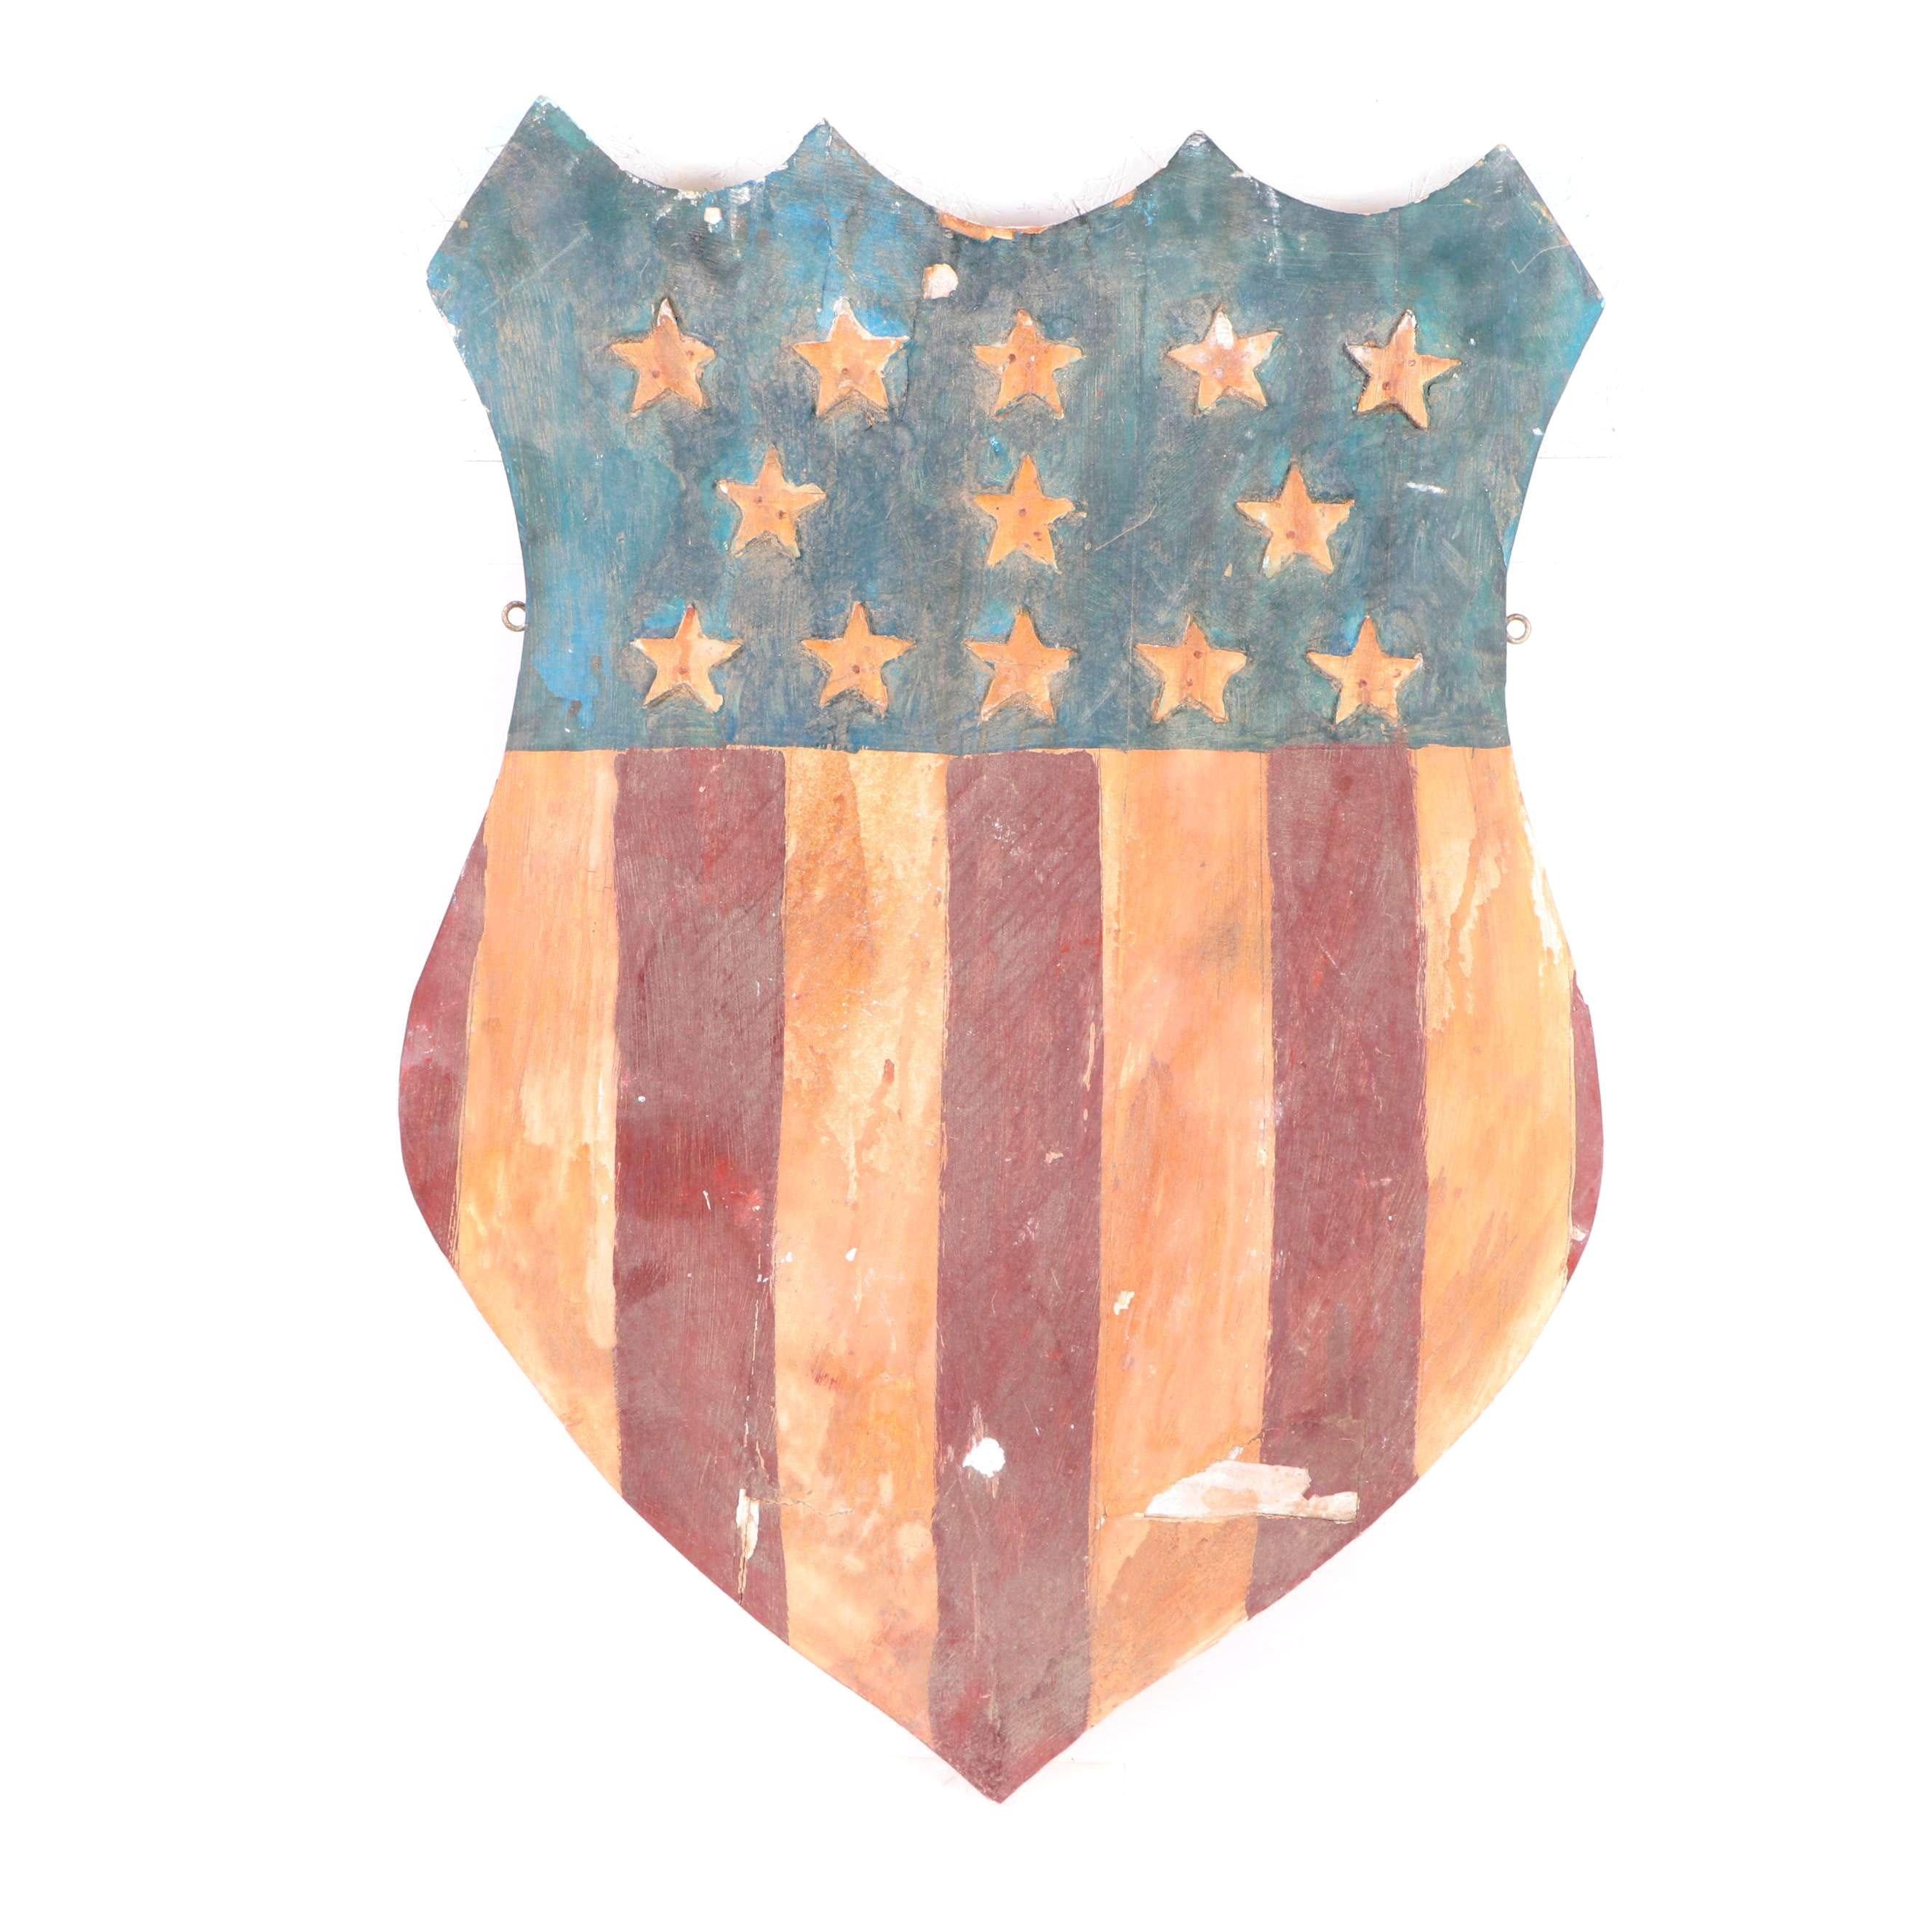 Wooden Folk Art American Flag Shield